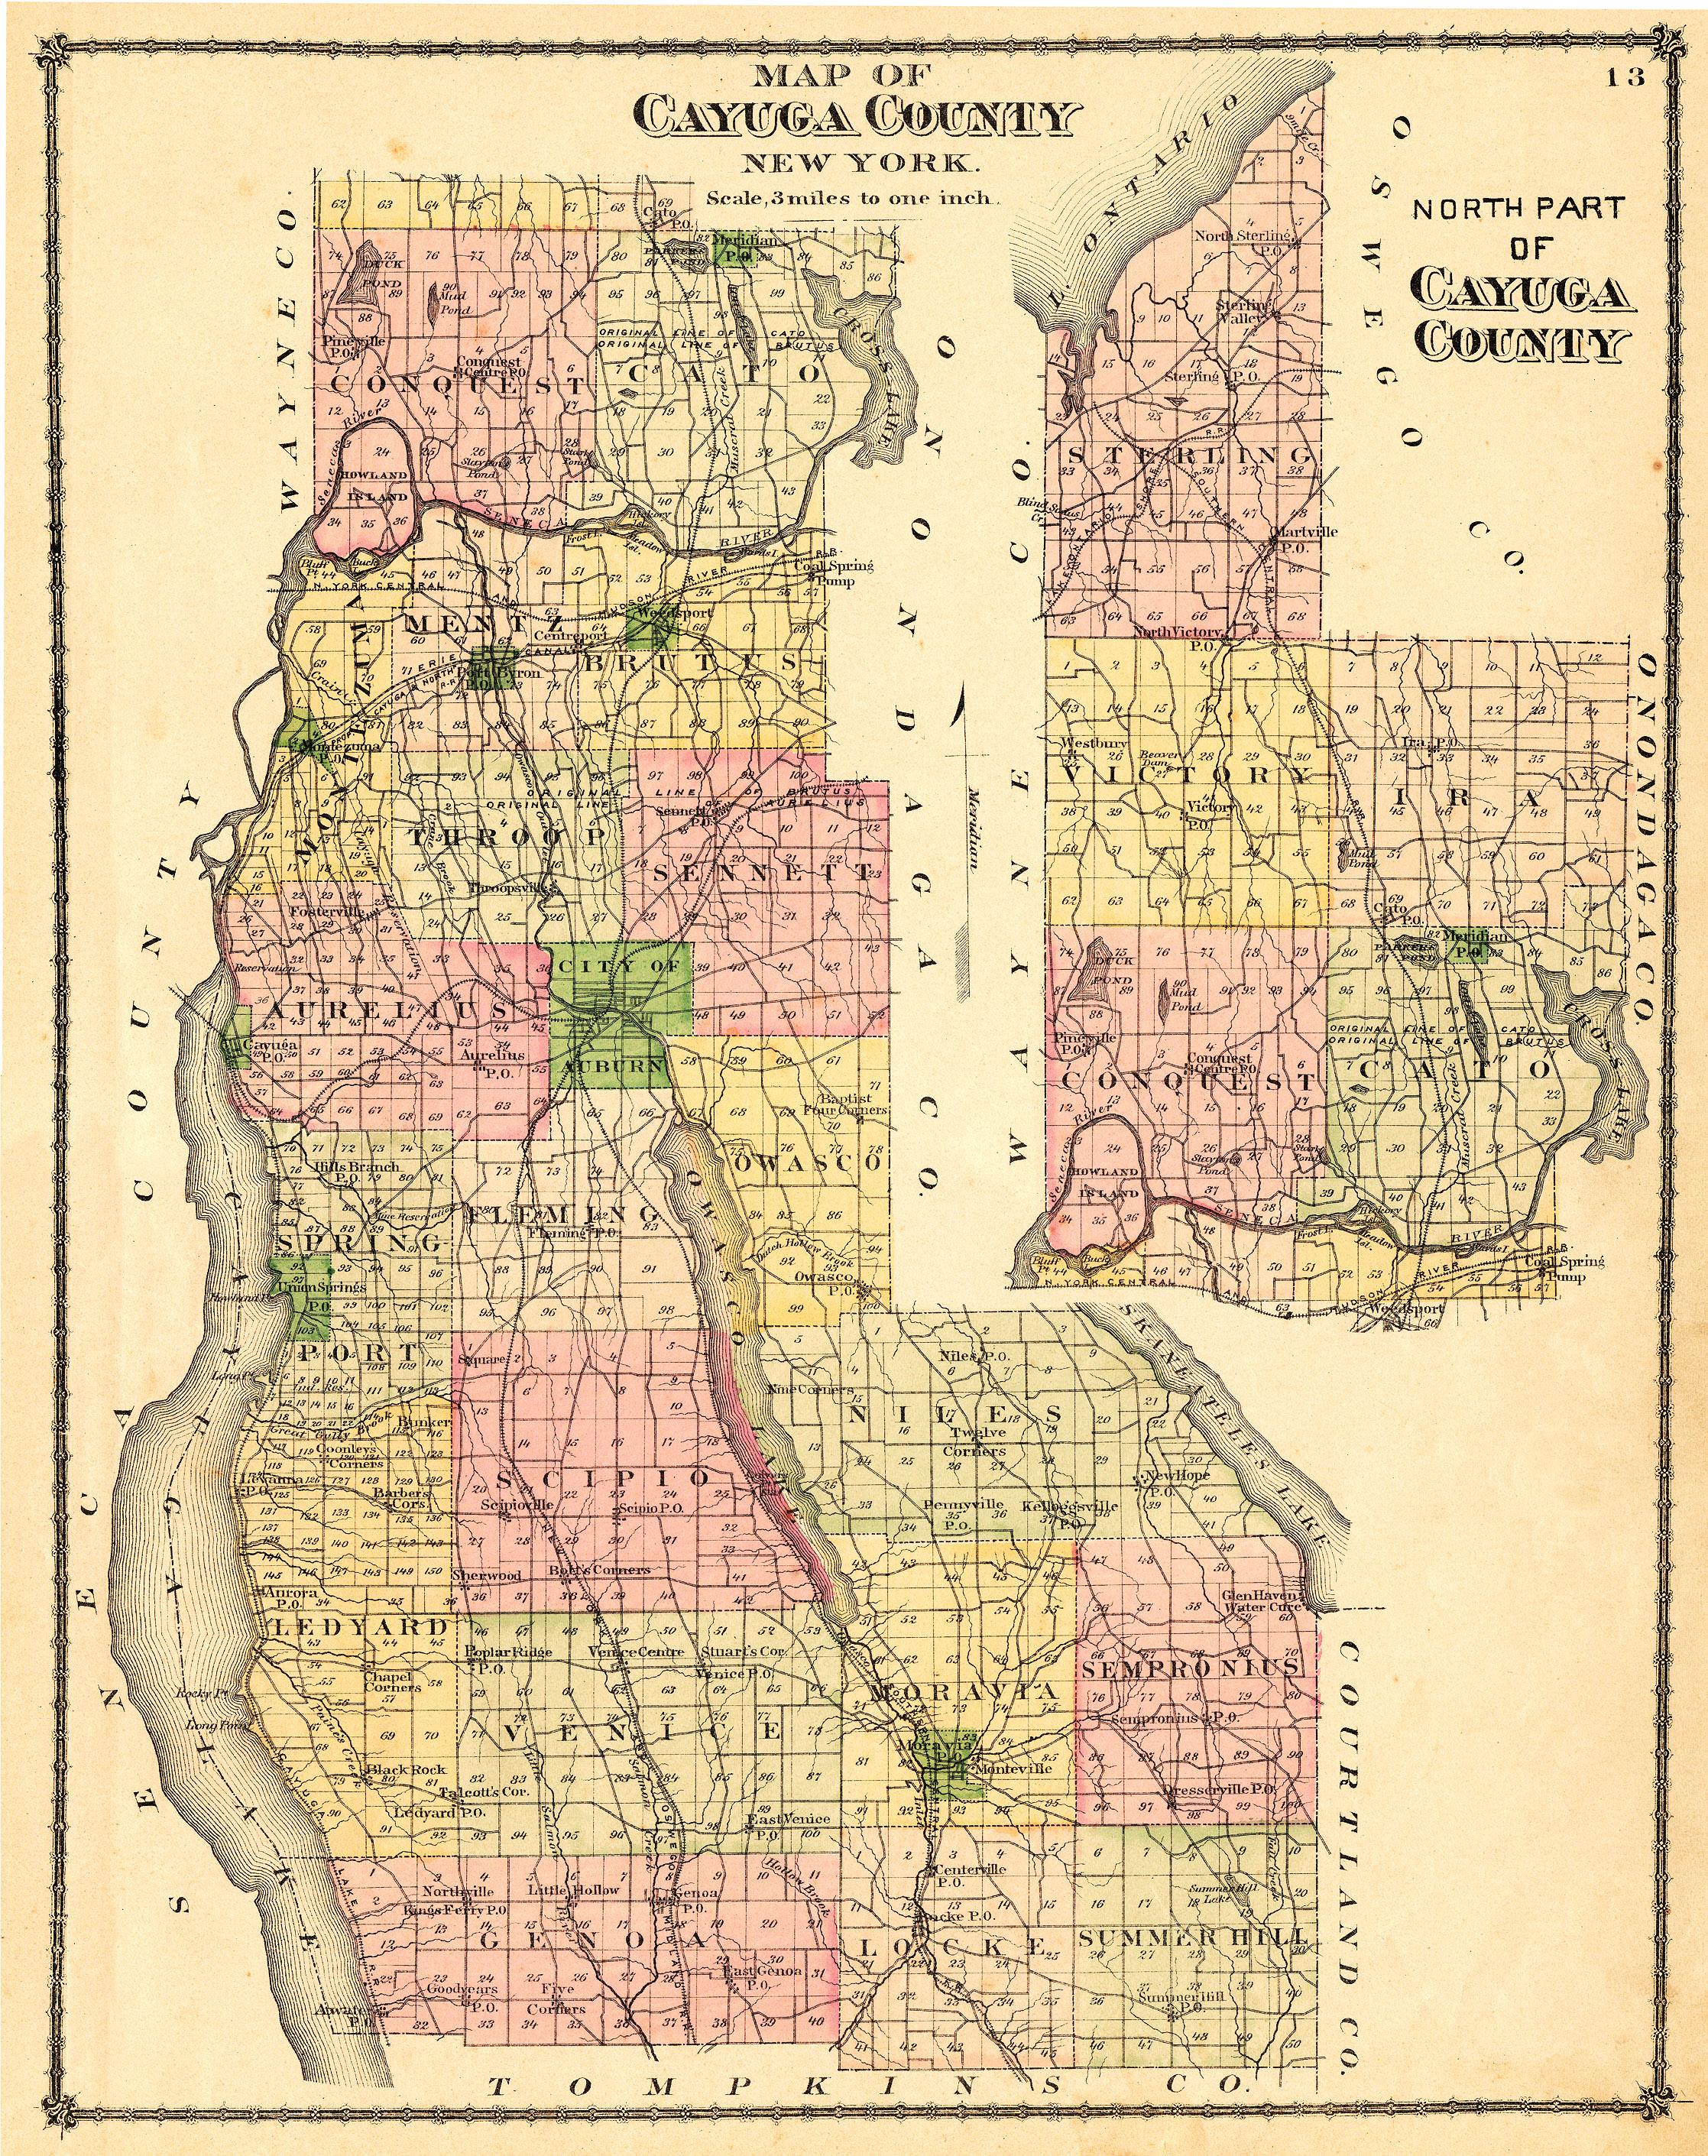 New york cayuga county - 1875 Cayuga County Map